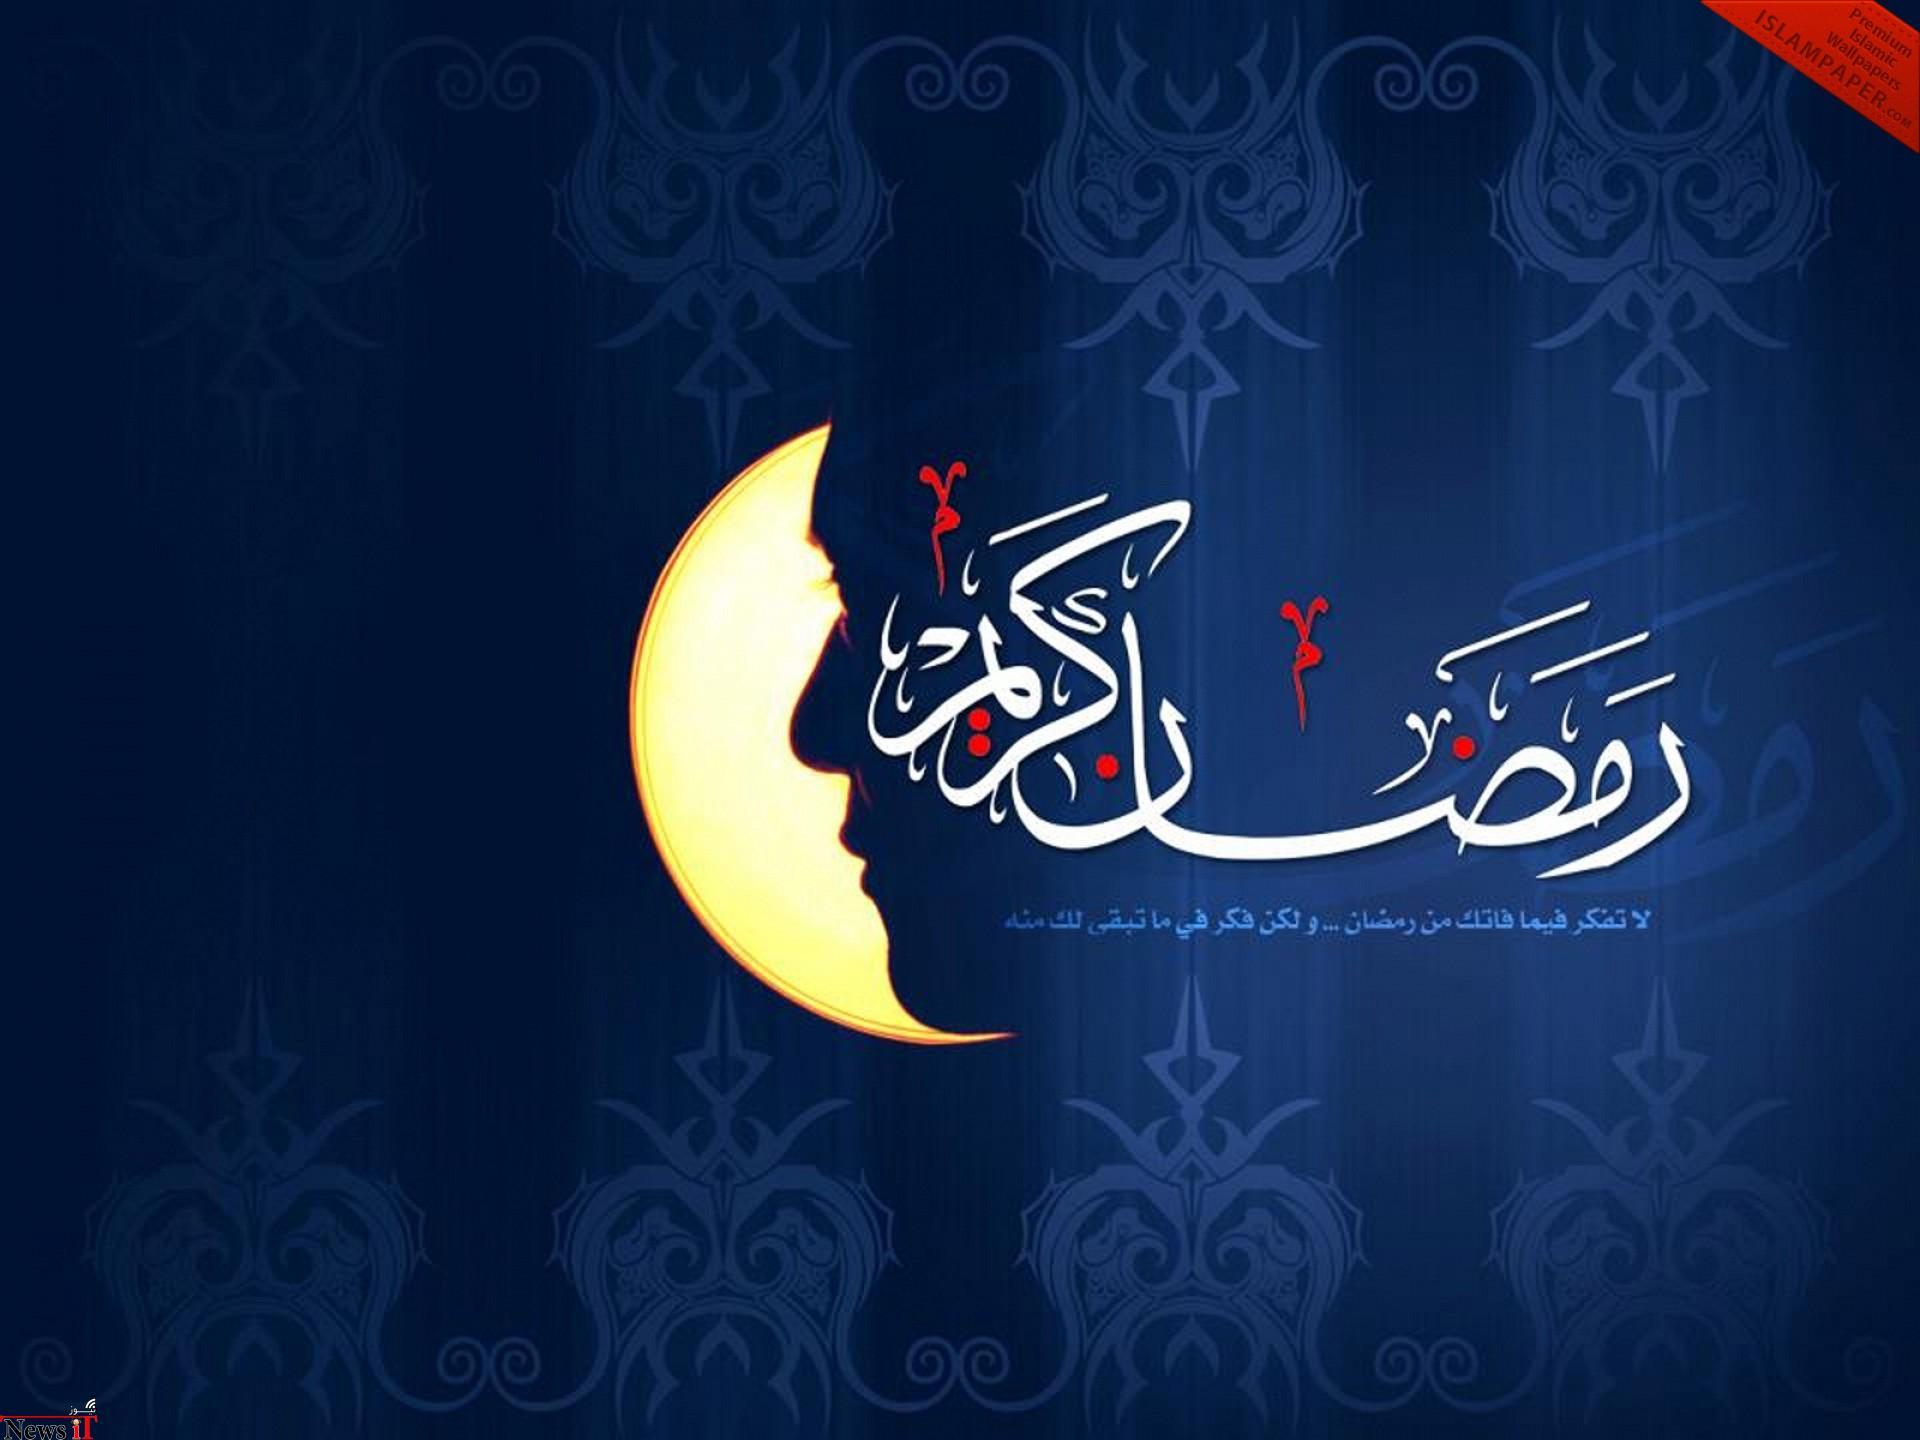 ramadan-mubarak-kareem-wallpaper-2012-collection-130